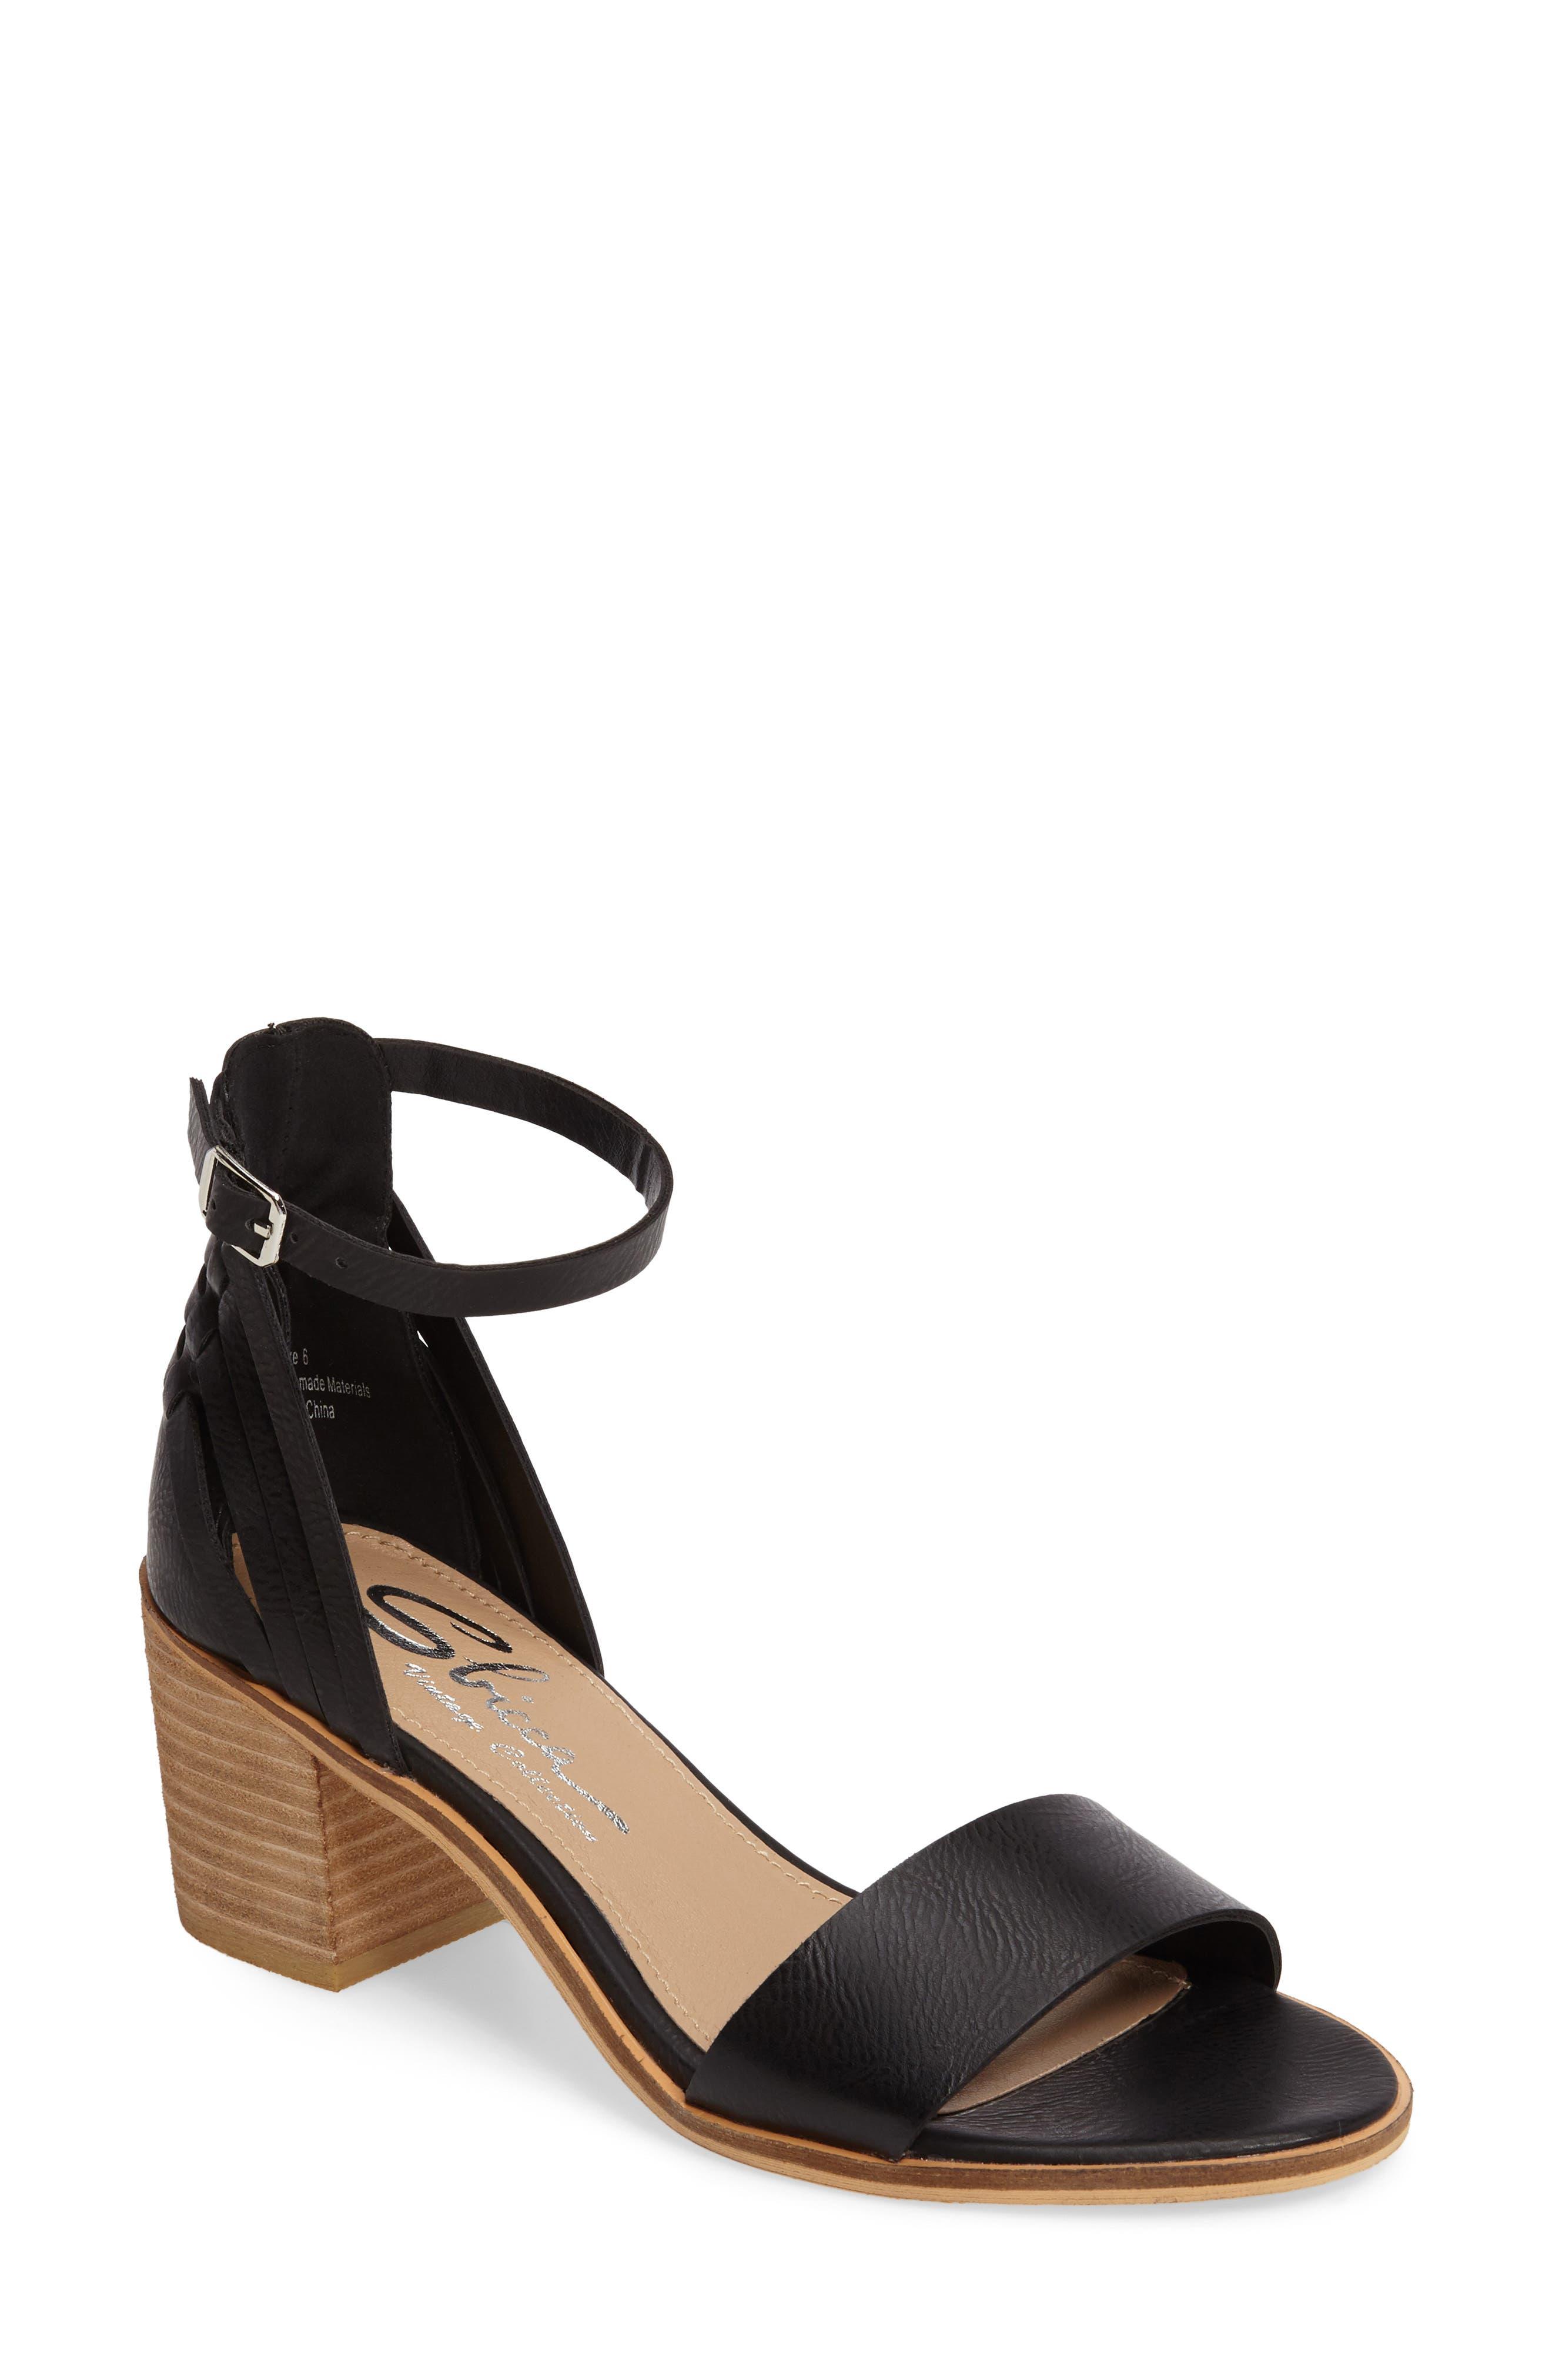 Fars Block Heel Sandal,                             Main thumbnail 1, color,                             001